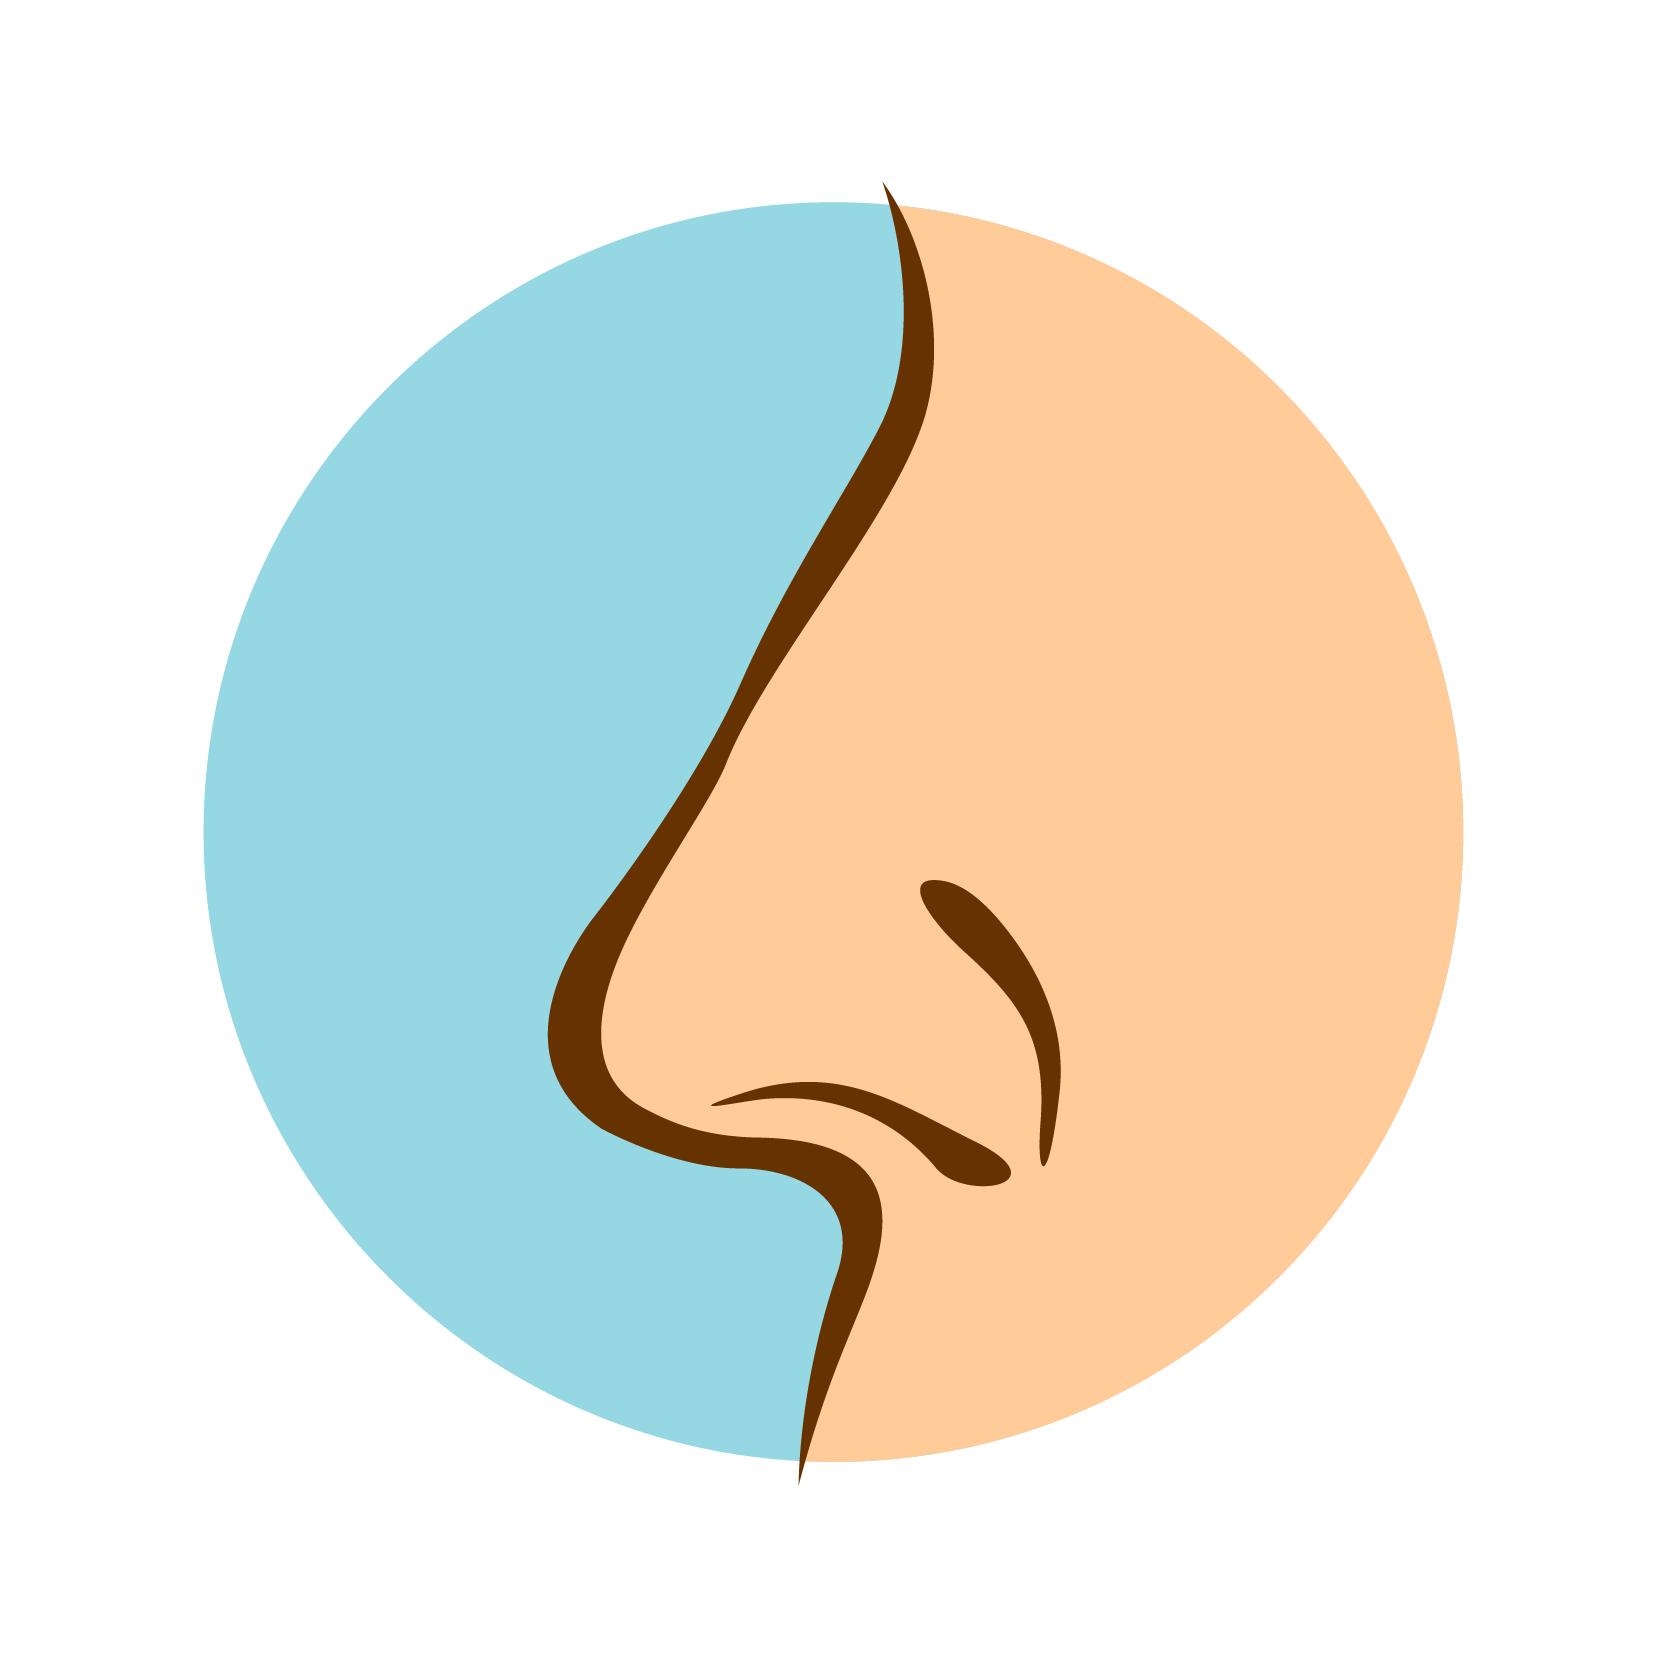 illustration of a nose